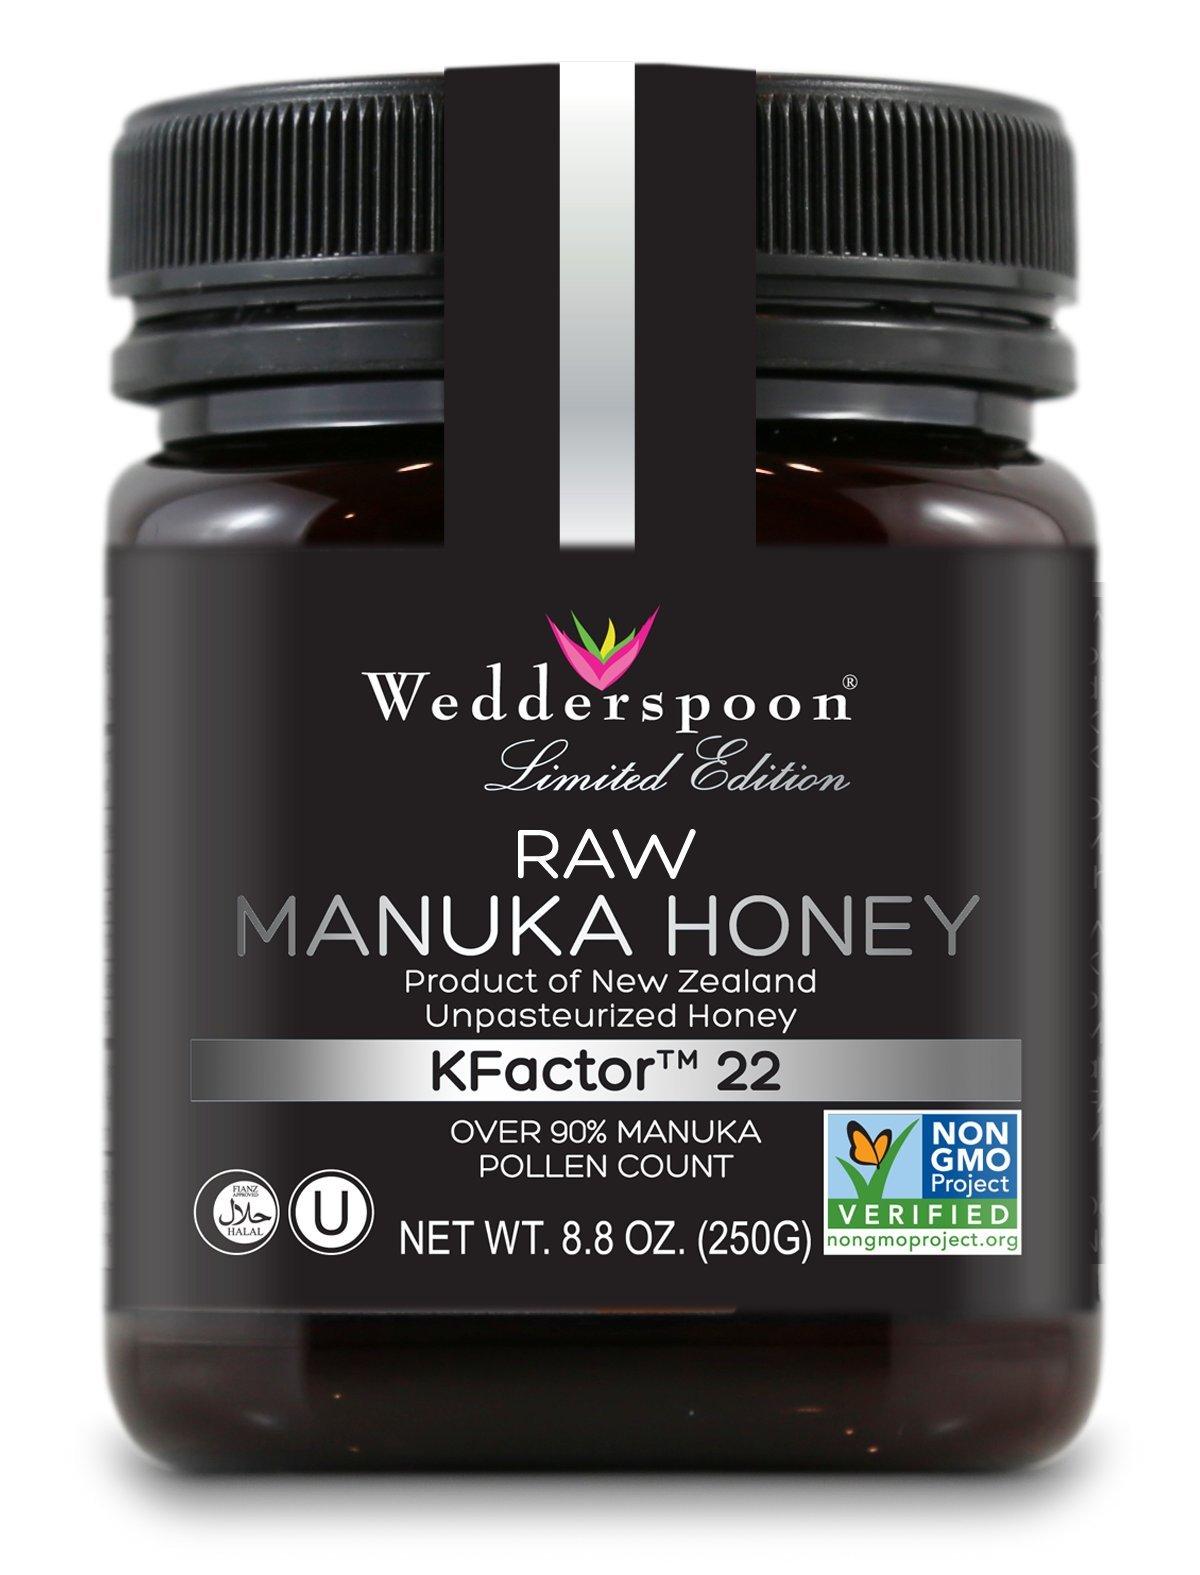 Wedderspoon Raw Premium Kfactor 22 Manuka Honey, 8.8 Ounce